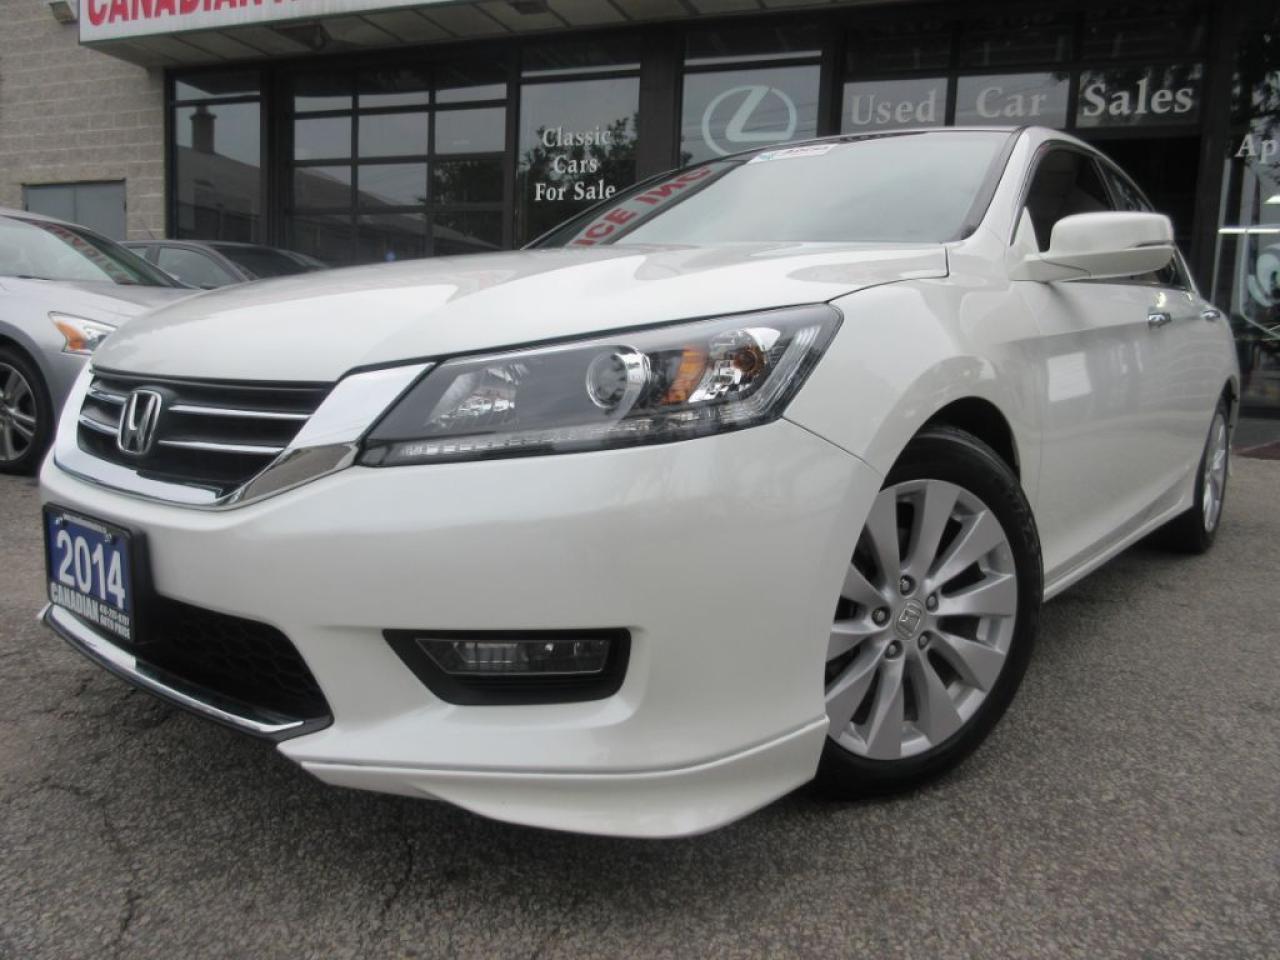 2014 Honda Accord EX-L-LEATHER-SUROOF-CAMERA-BLUETOOTH